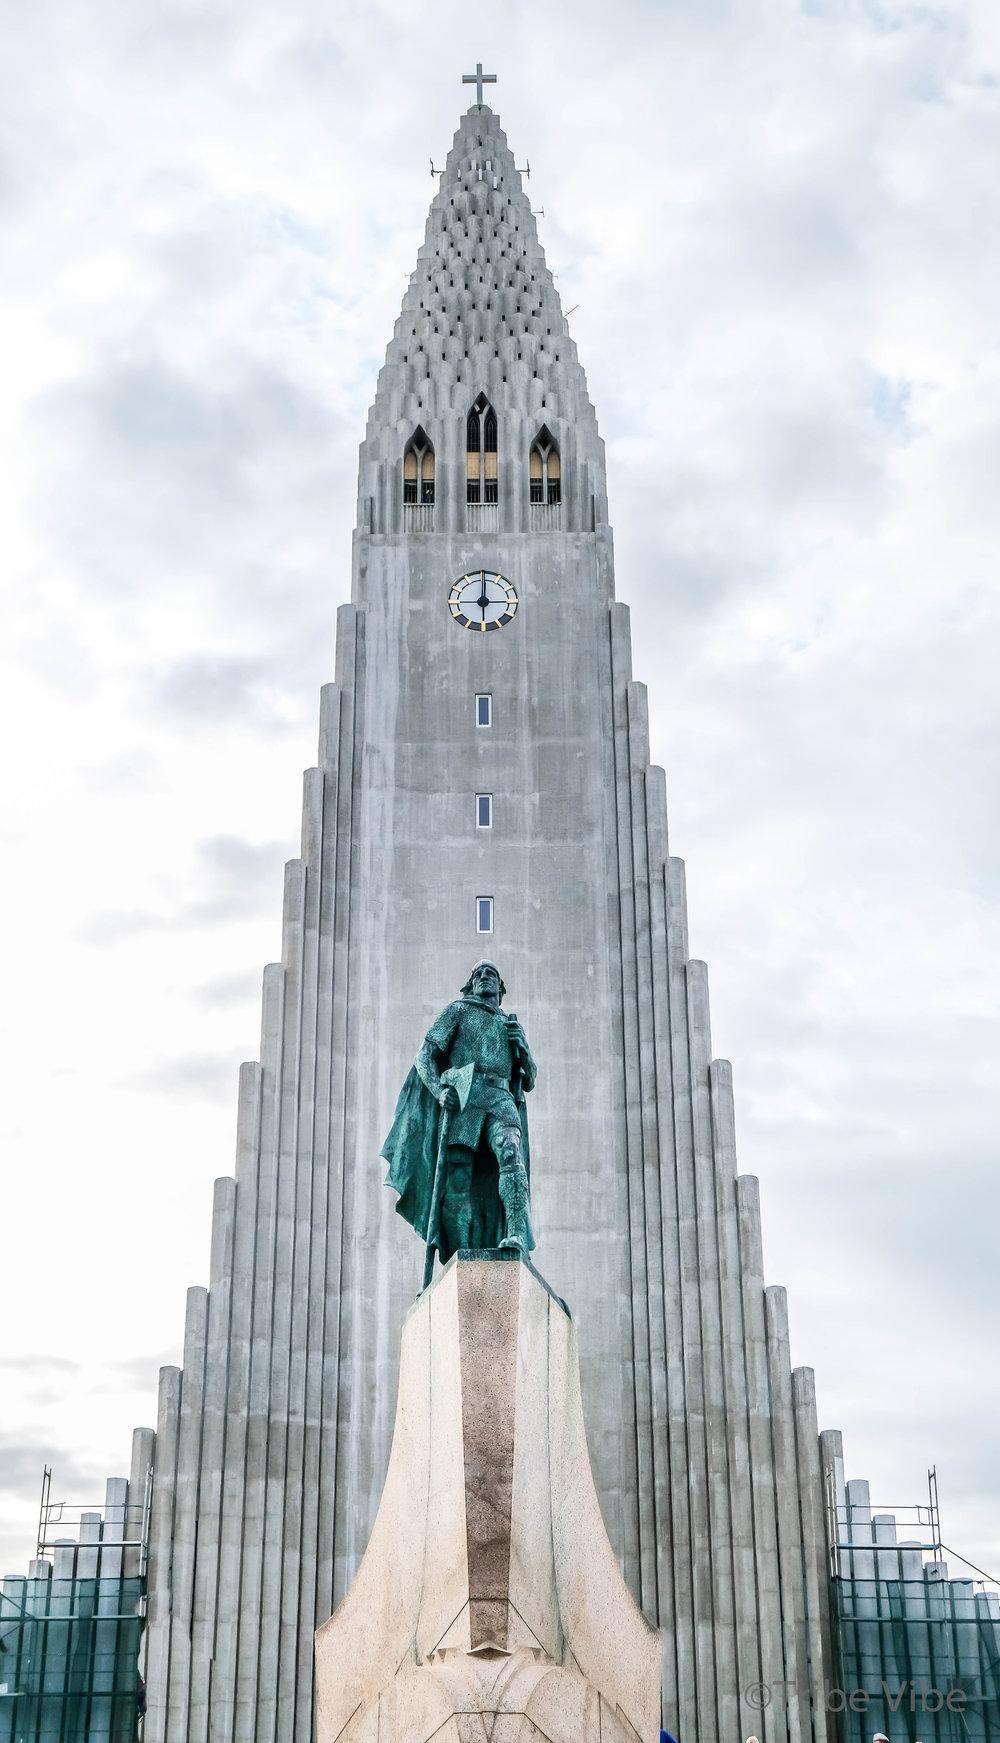 Hallgrimskirkja Luthern Church in Reykjavik